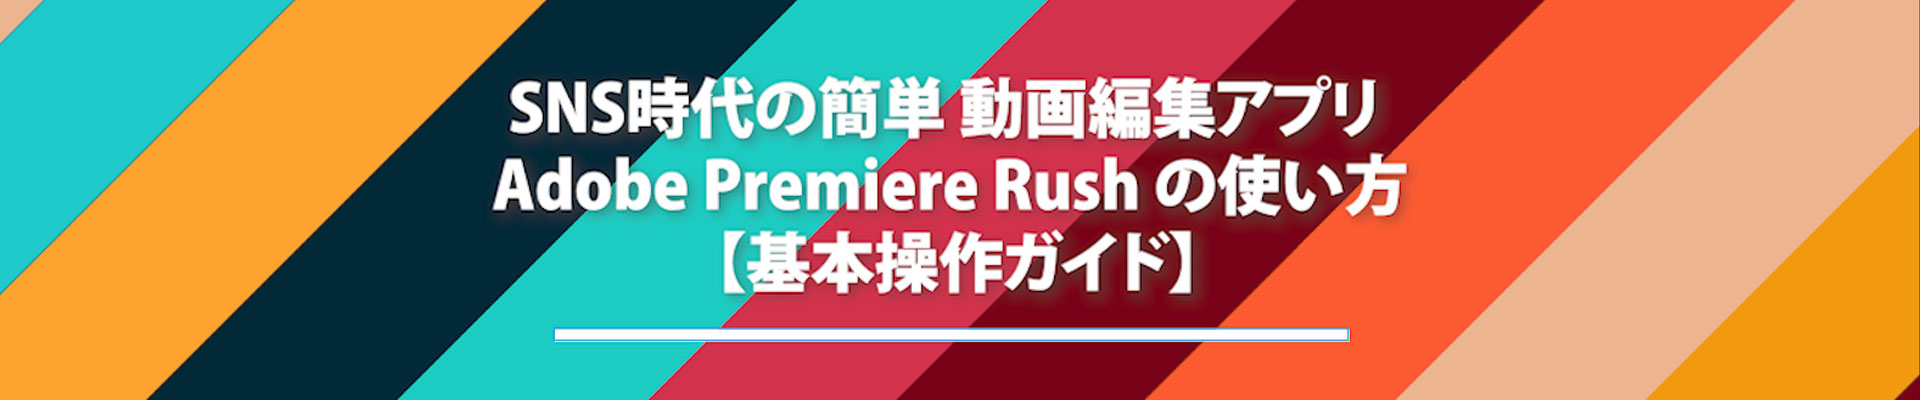 Adobe Premiere Rush の使い方 【基本操作ガイド】